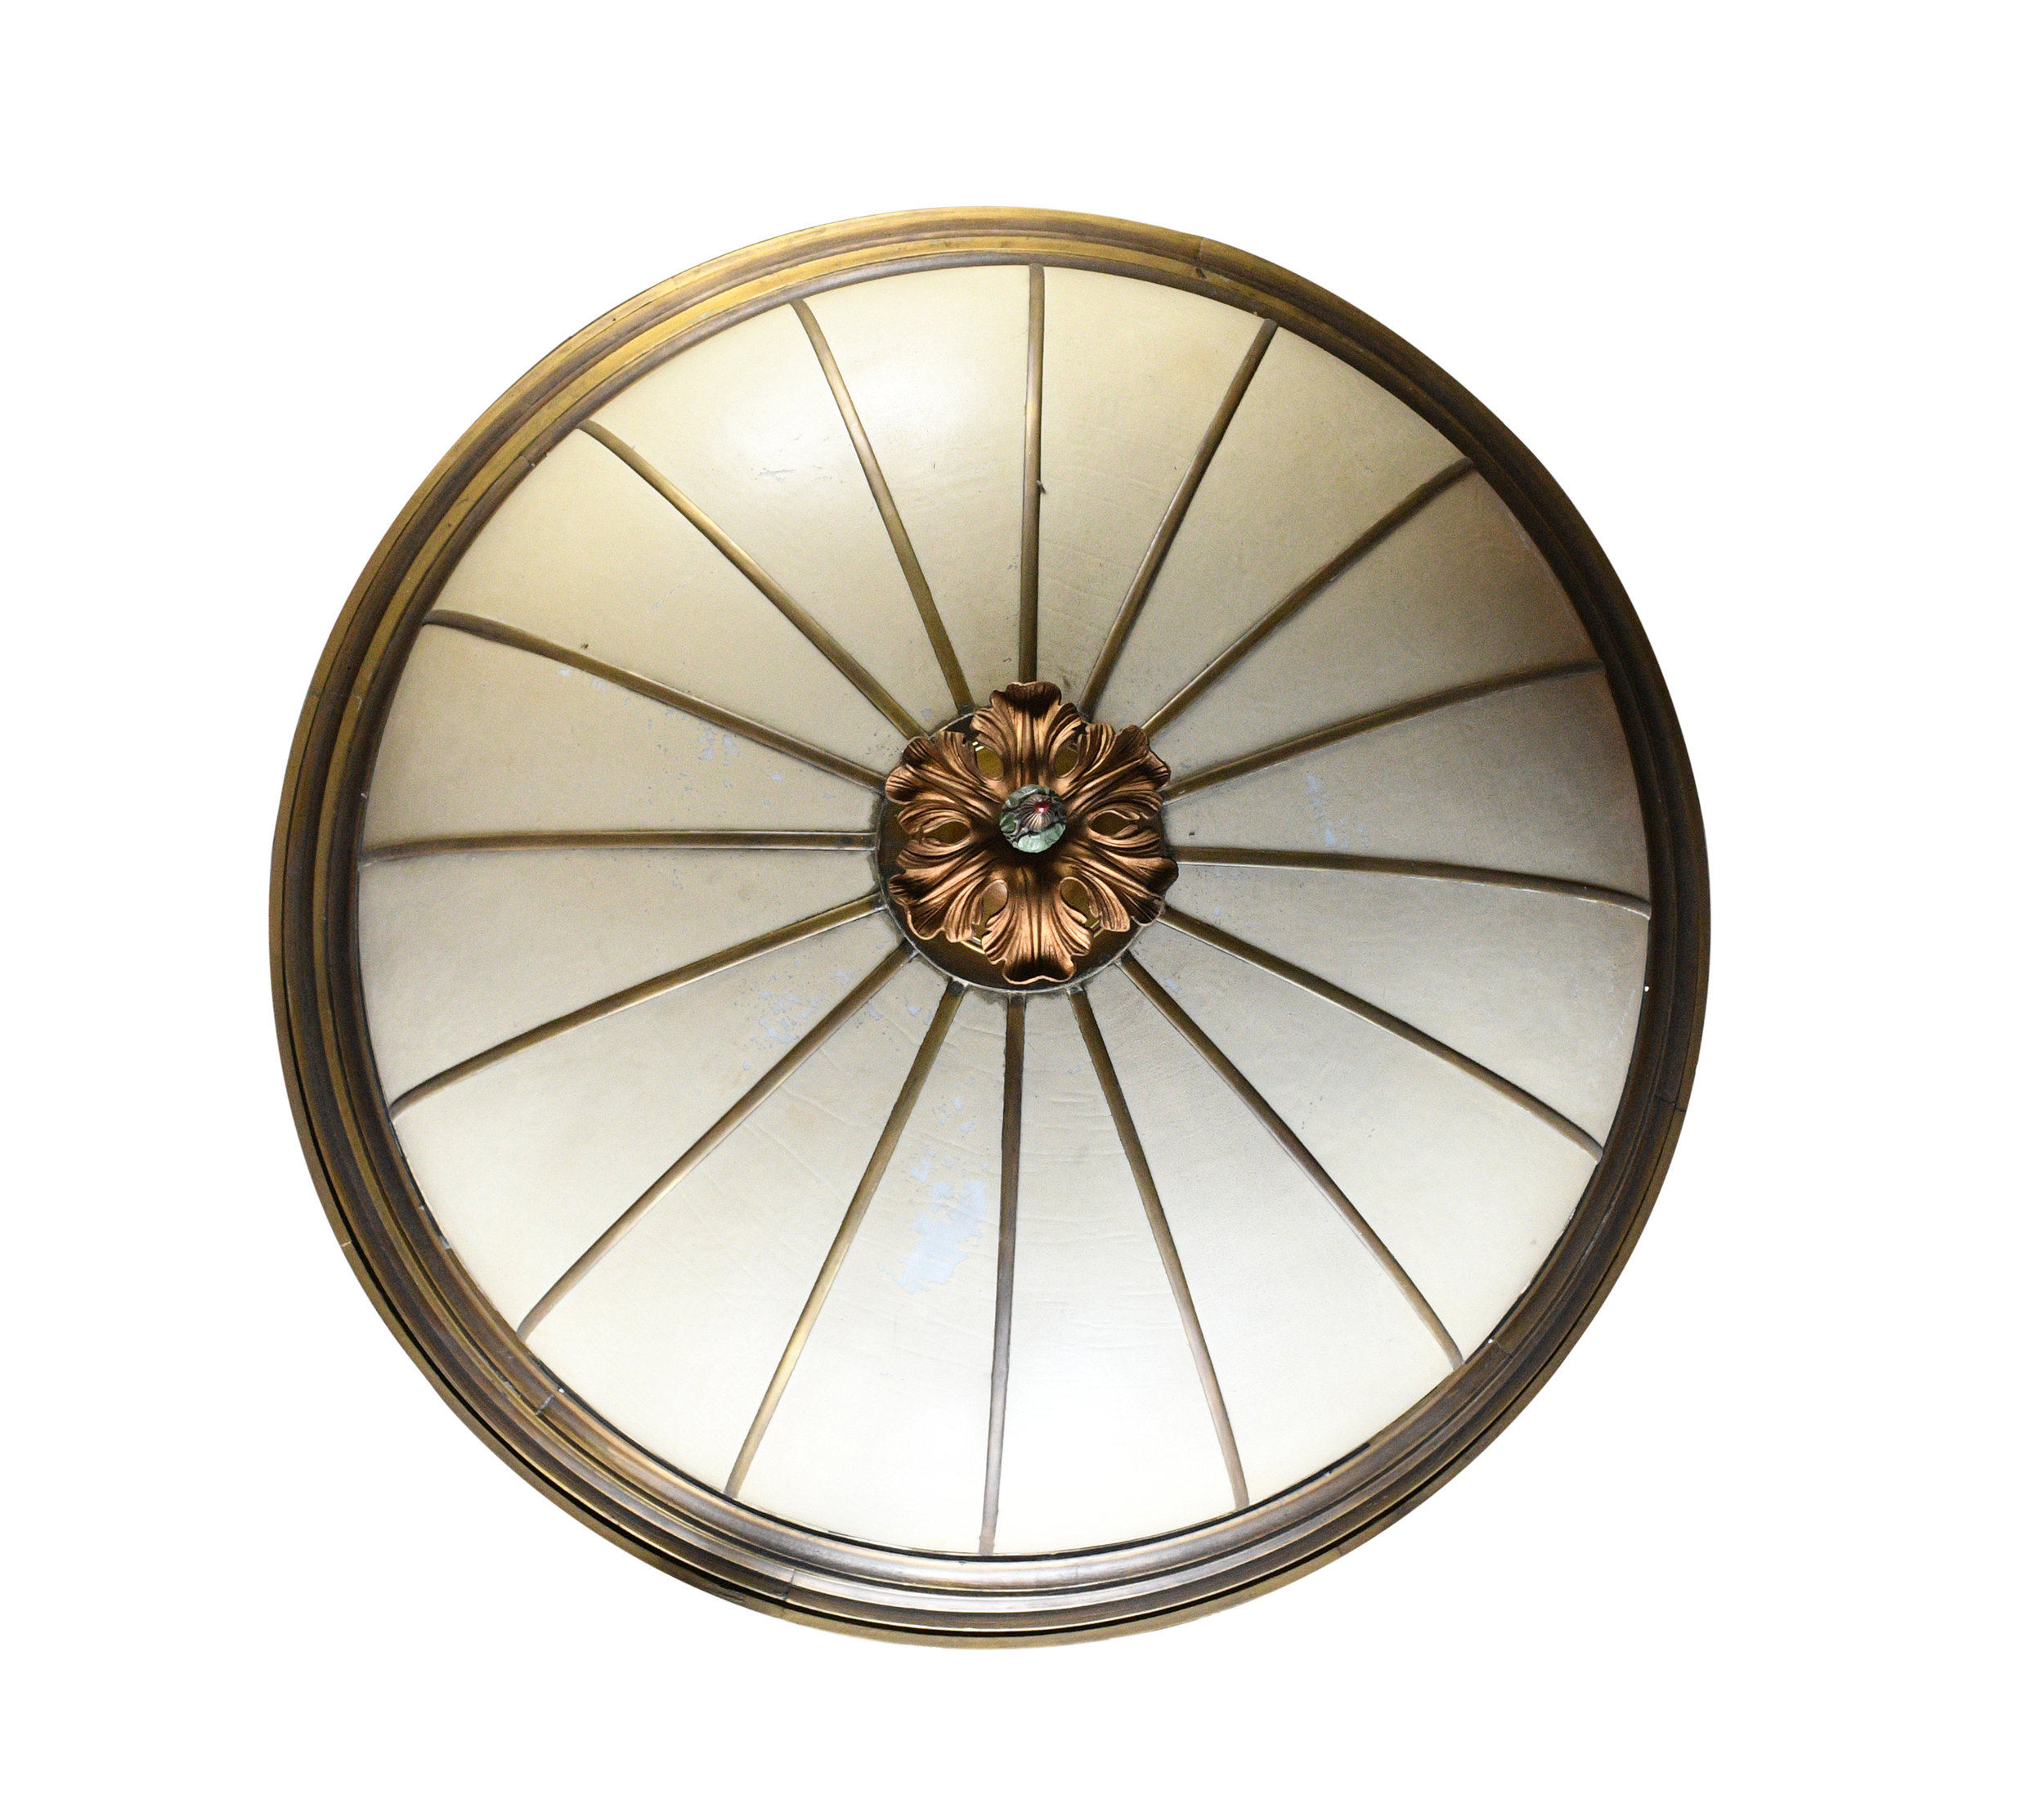 47787-large-flushmount-bowl-with-glass-10.jpg